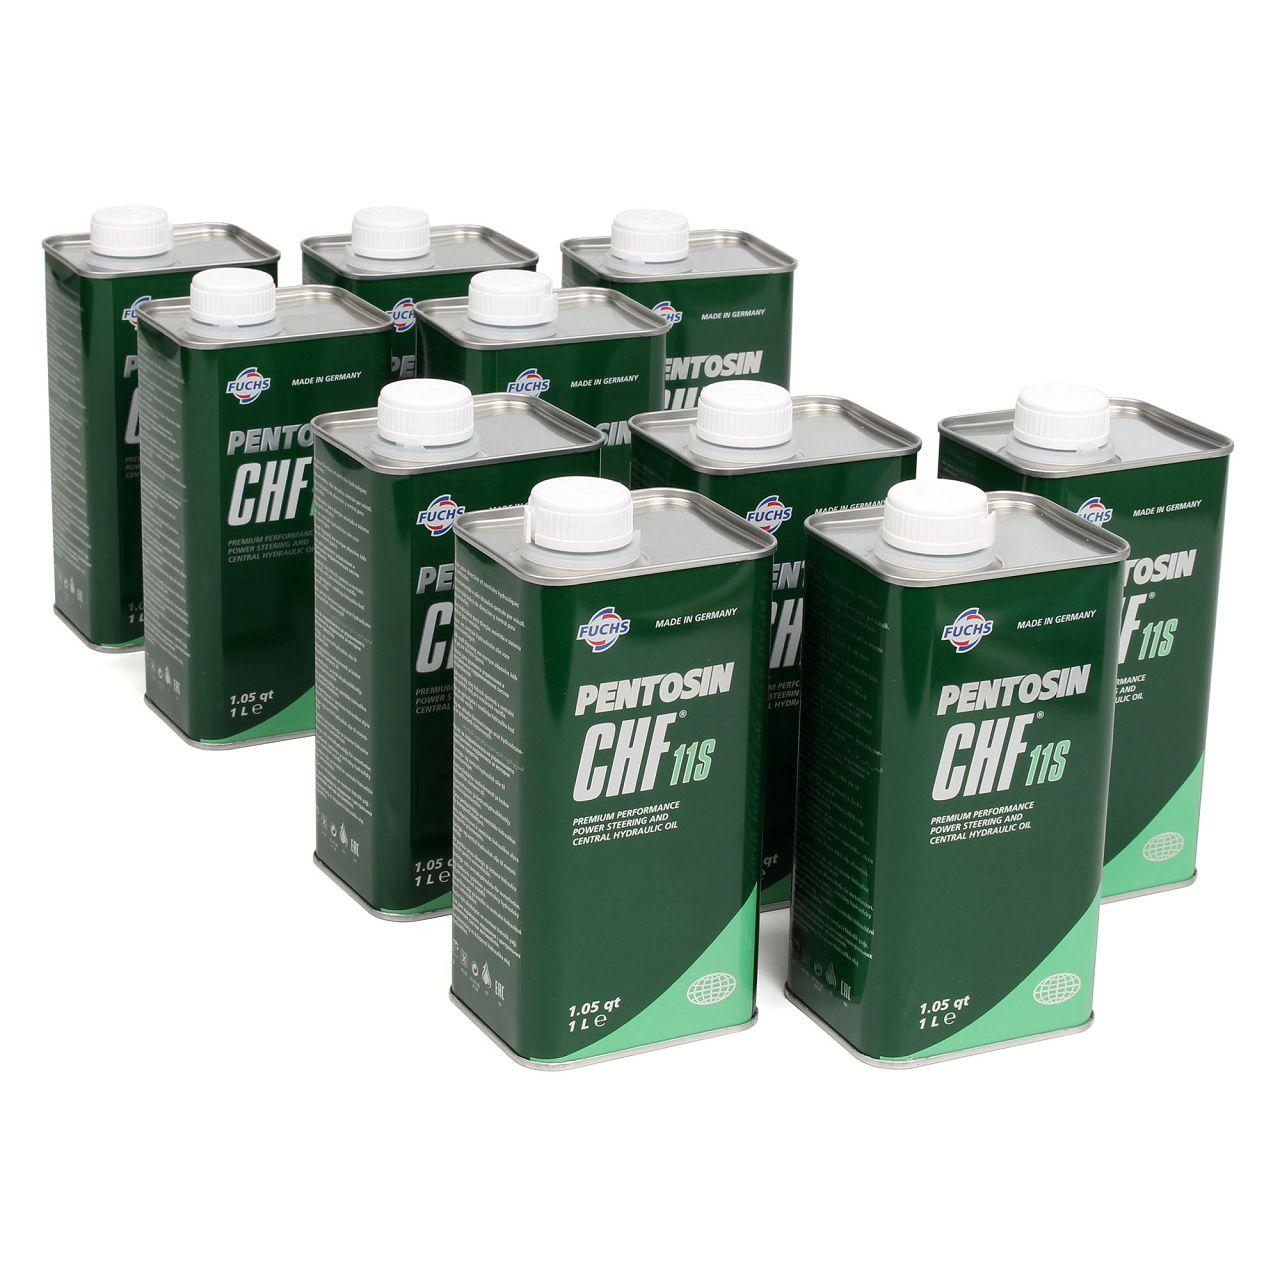 10x 1L 10 Liter PENTOSIN Hydrauliköl Servolenkungsöl CHF 11S MB 0019892403